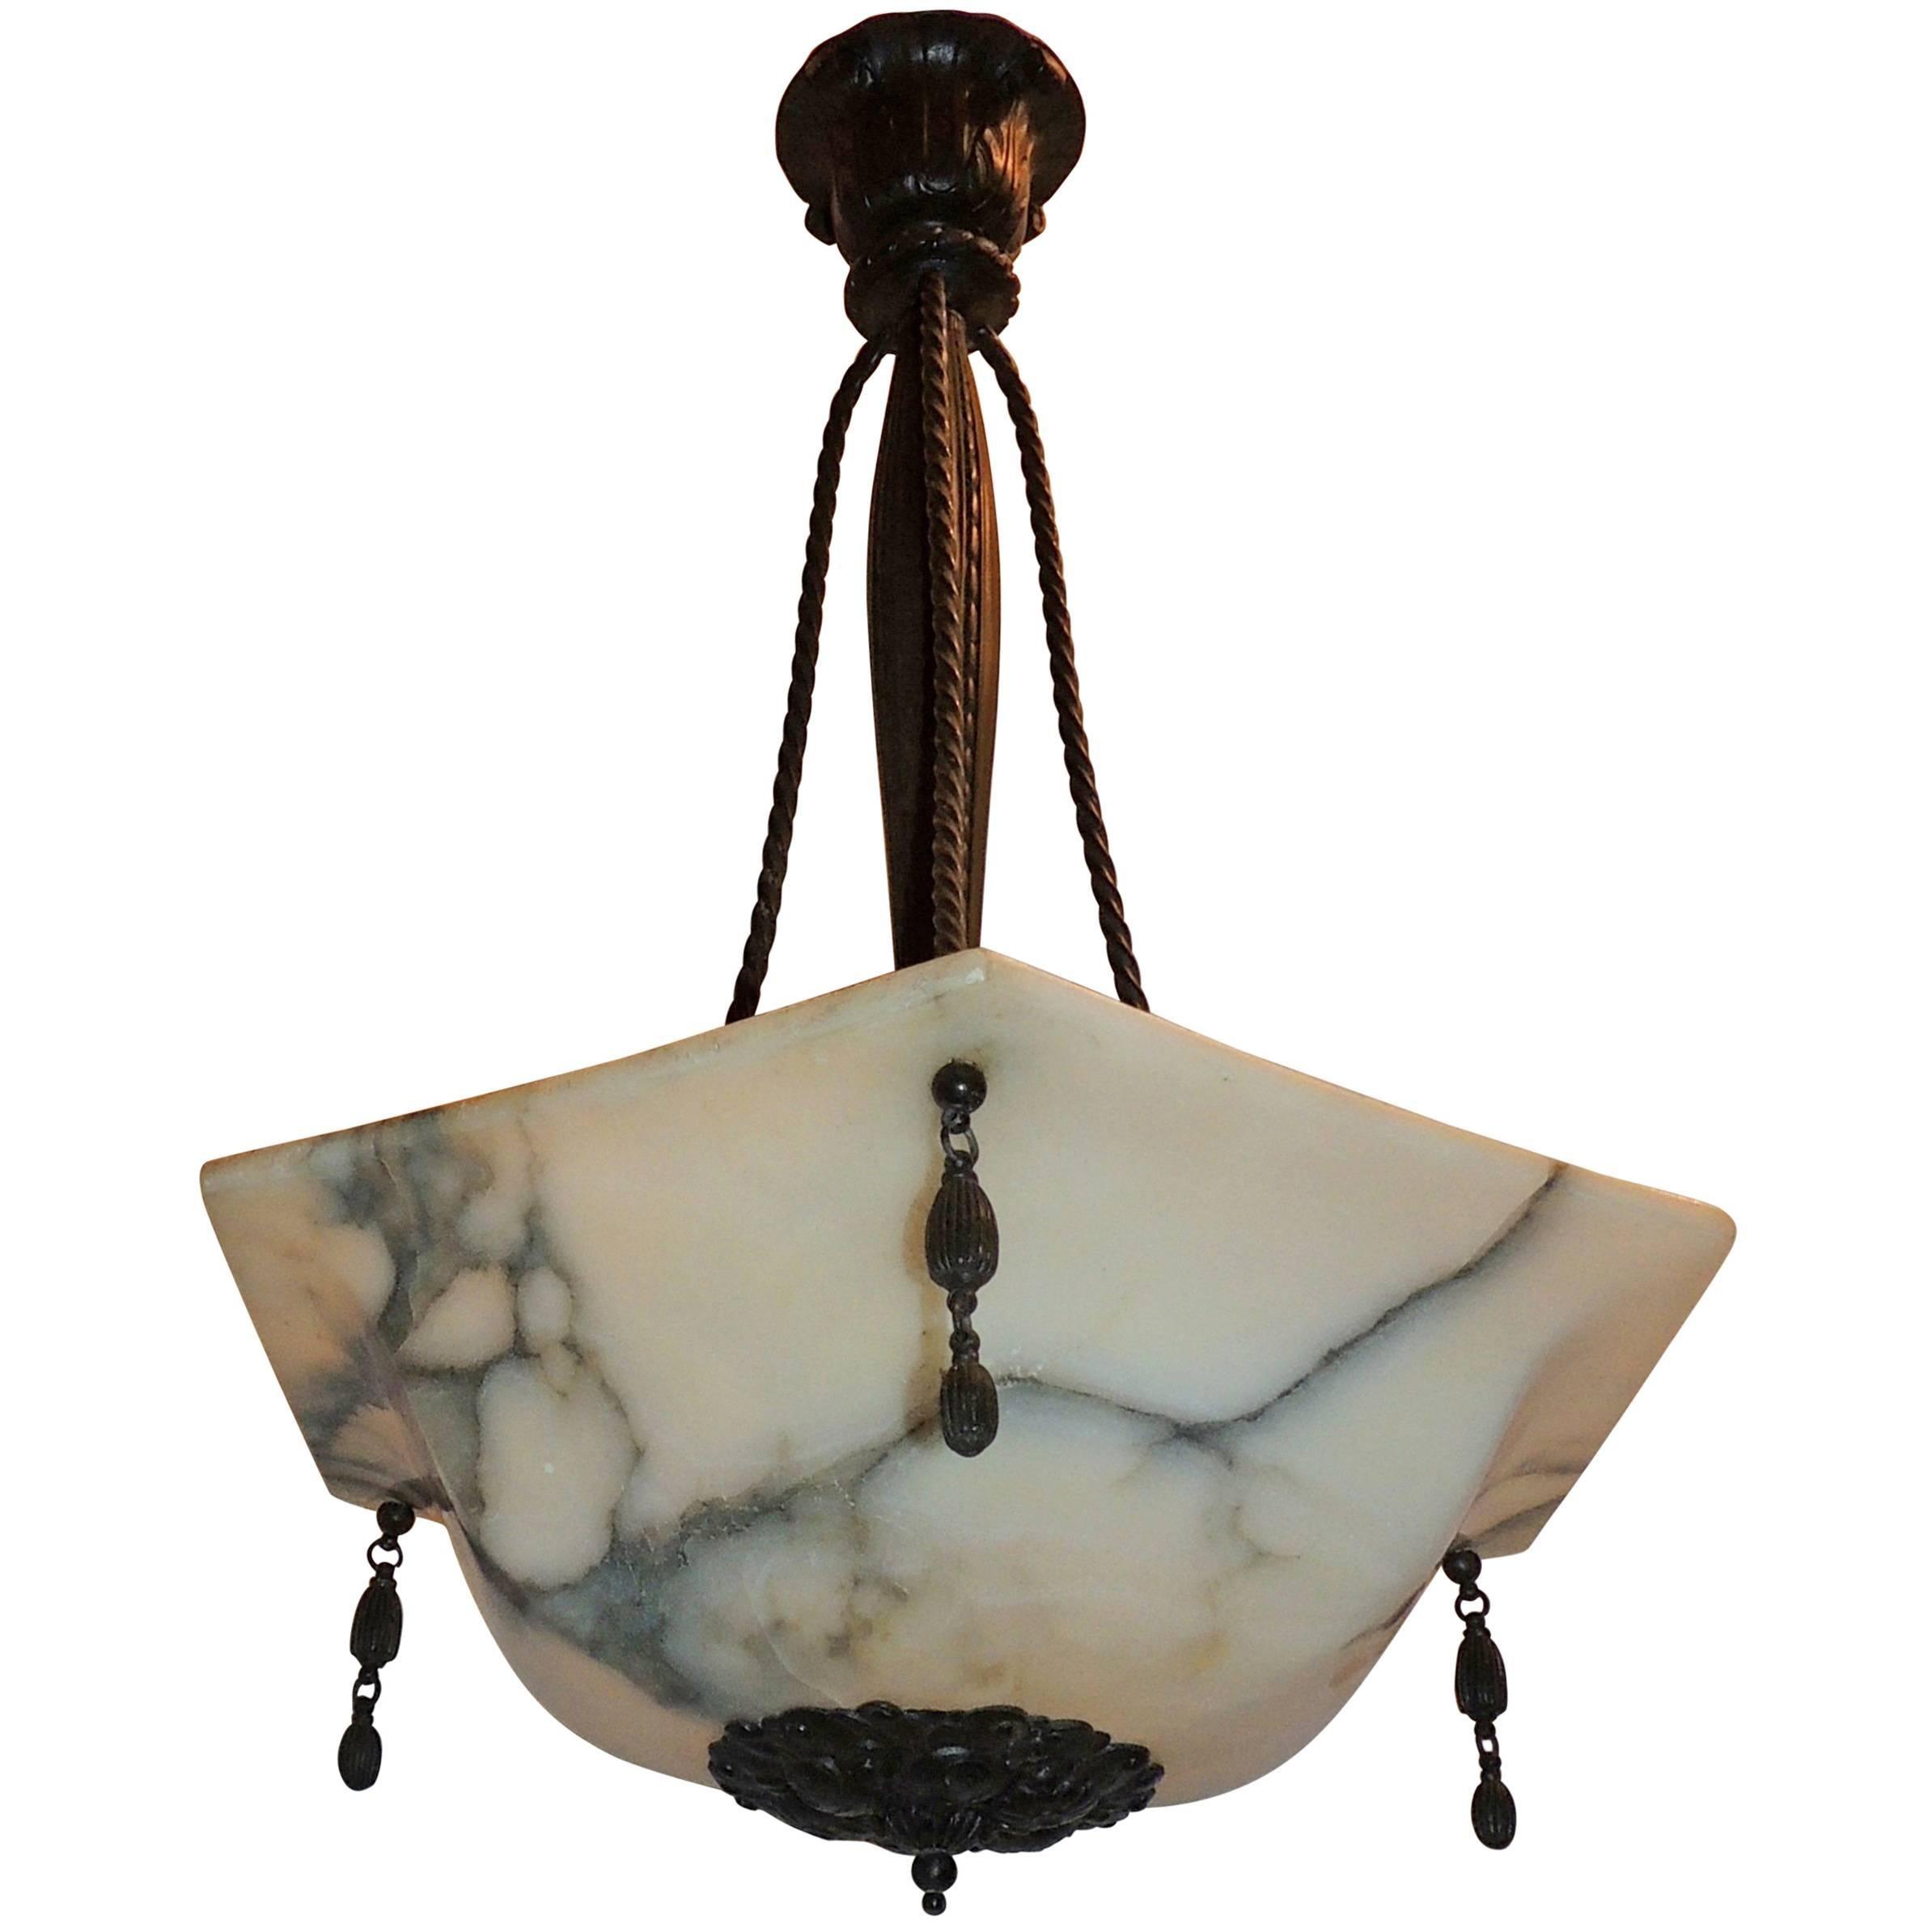 Wonderful French Art Deco Alabaster Patina Bronze Pendent Chandelier Fixture